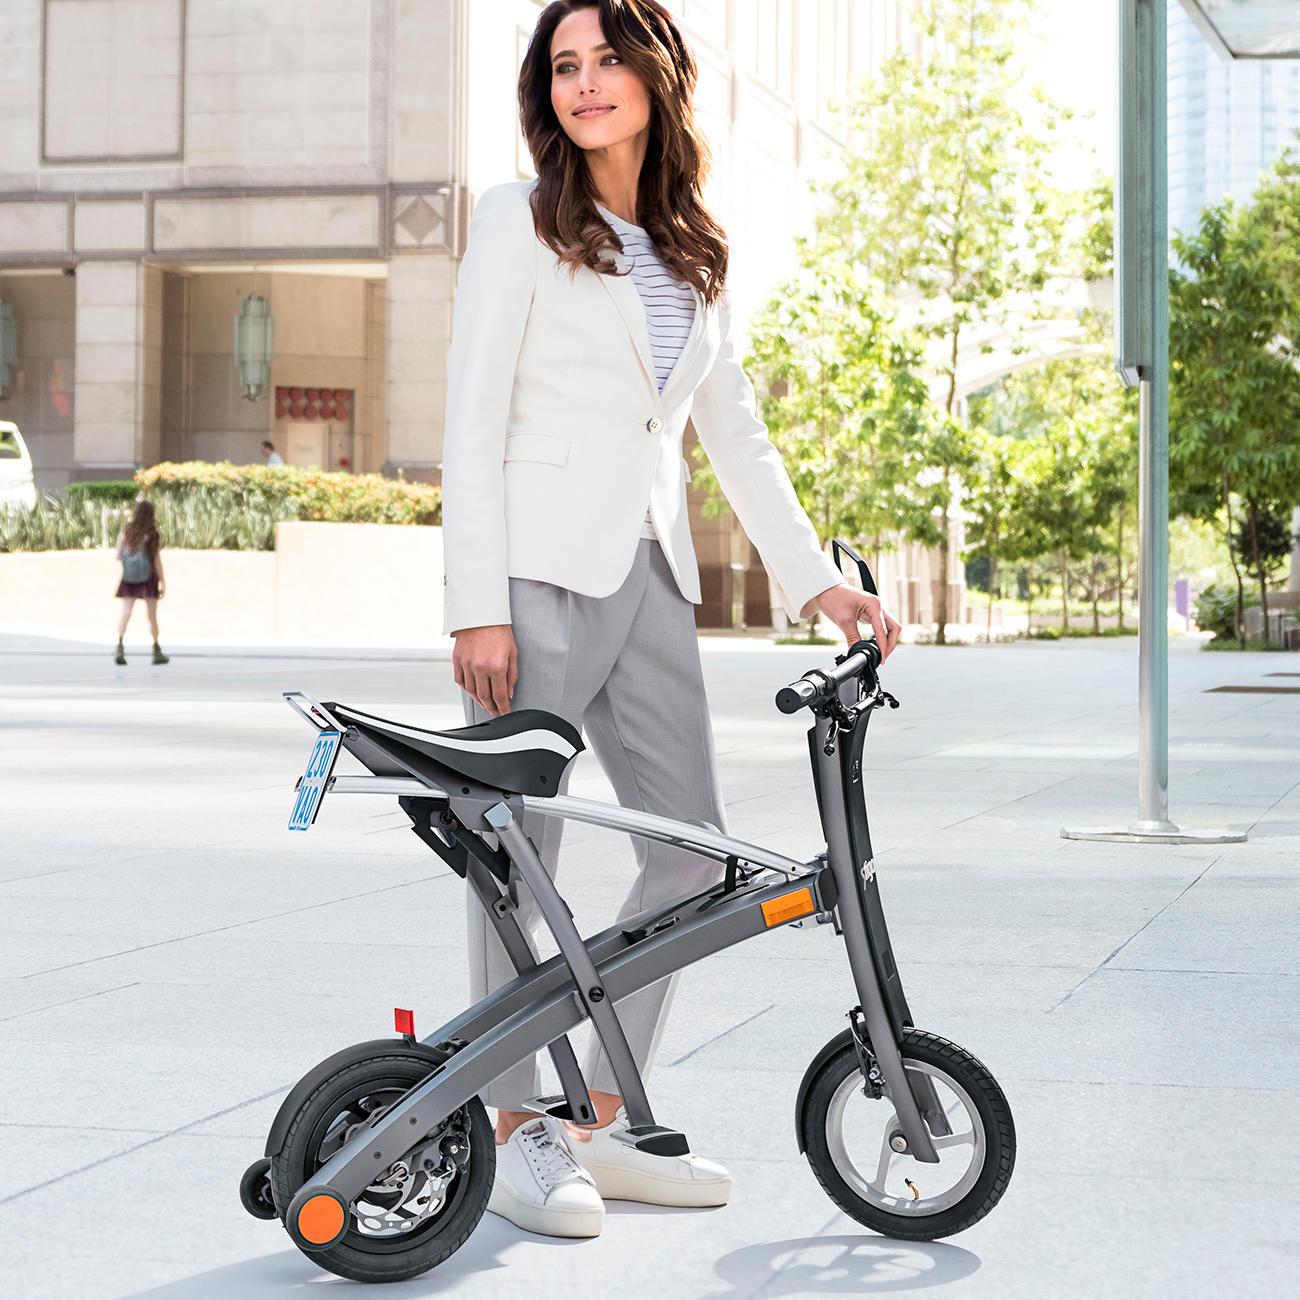 stigo bike 200 w e scooter schwarz silber online kaufen. Black Bedroom Furniture Sets. Home Design Ideas